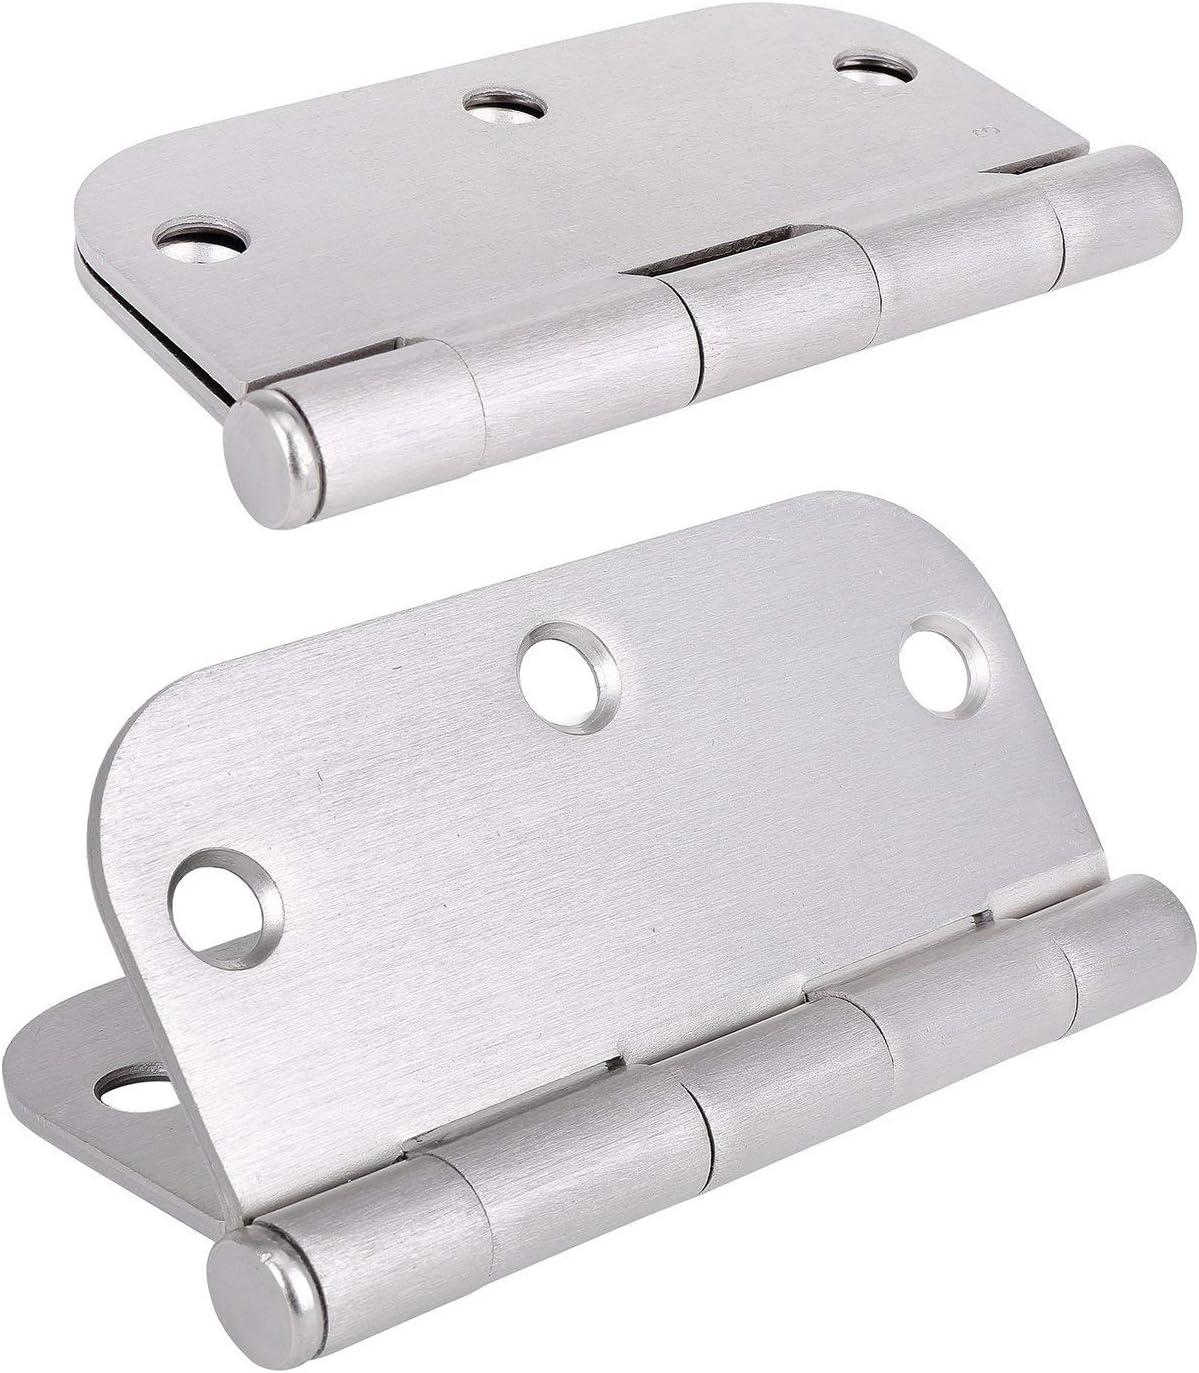 Y/&Y Decor Satin Nickel 3.5 x 3.5 Door Hinges with 5//8 Radius Corners Brushed Nickel 50 Pack